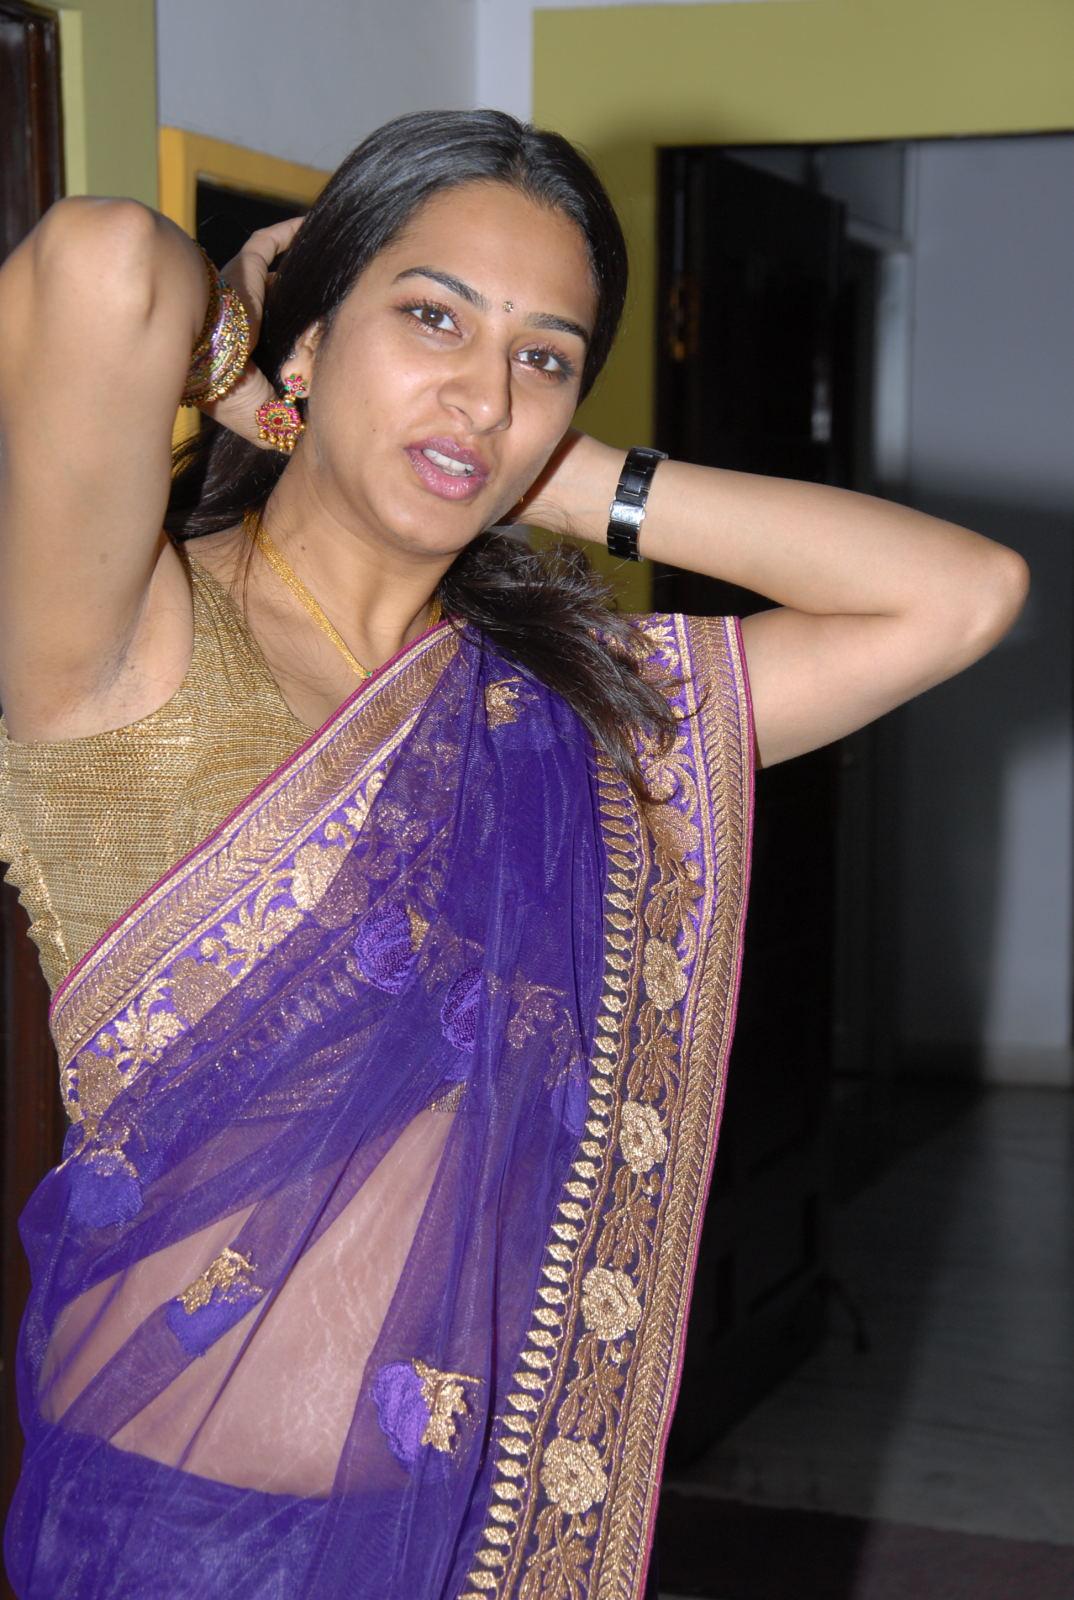 ... in: hot Stills , Surekha Vani Hot Saree Stills , telugu Hot Actress